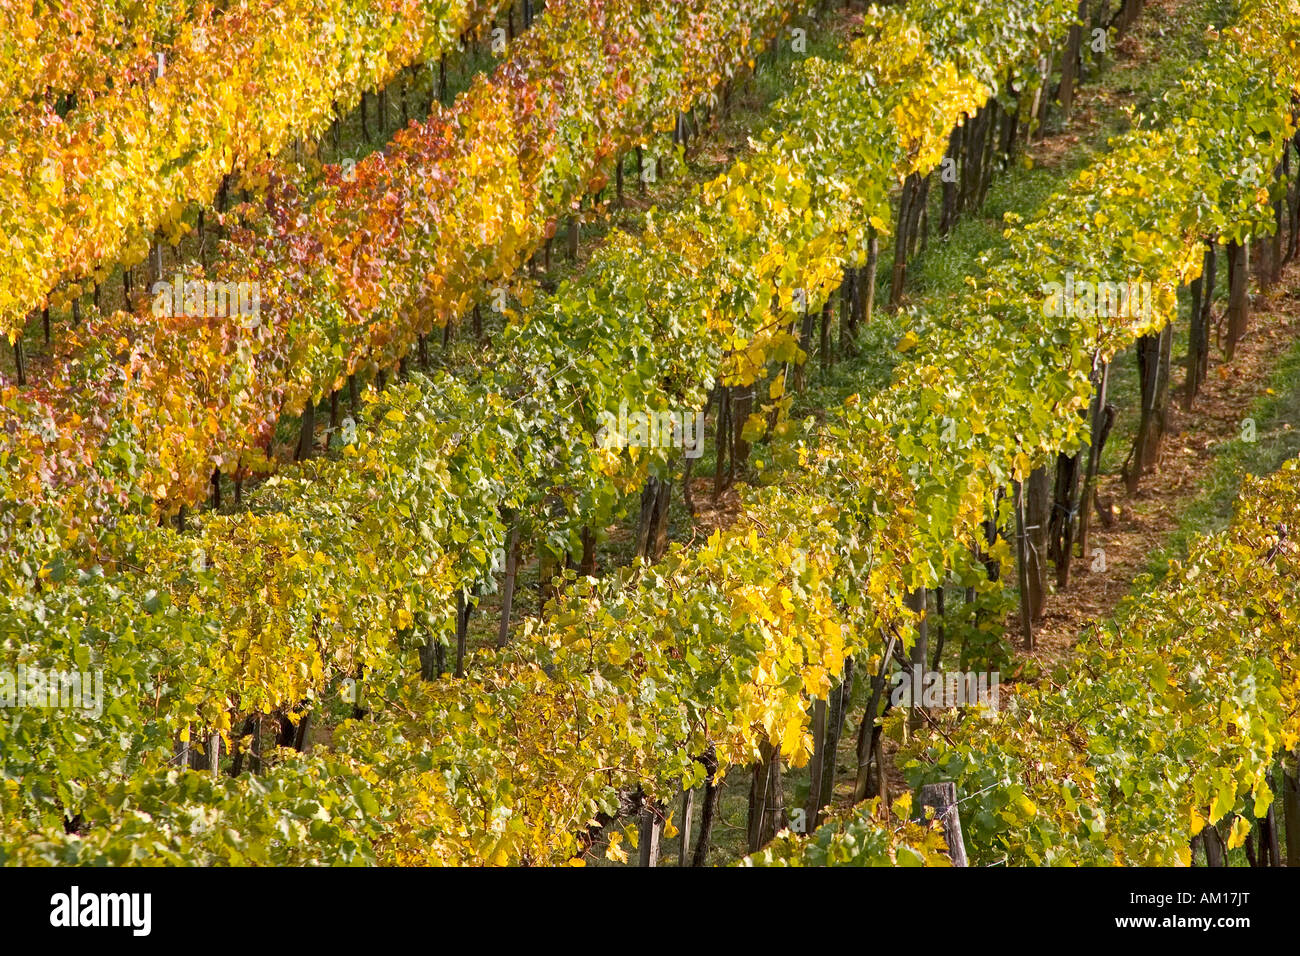 Vineyard in autumn, Perchtoldsdorf, Lower Austria, Austria Stock Photo